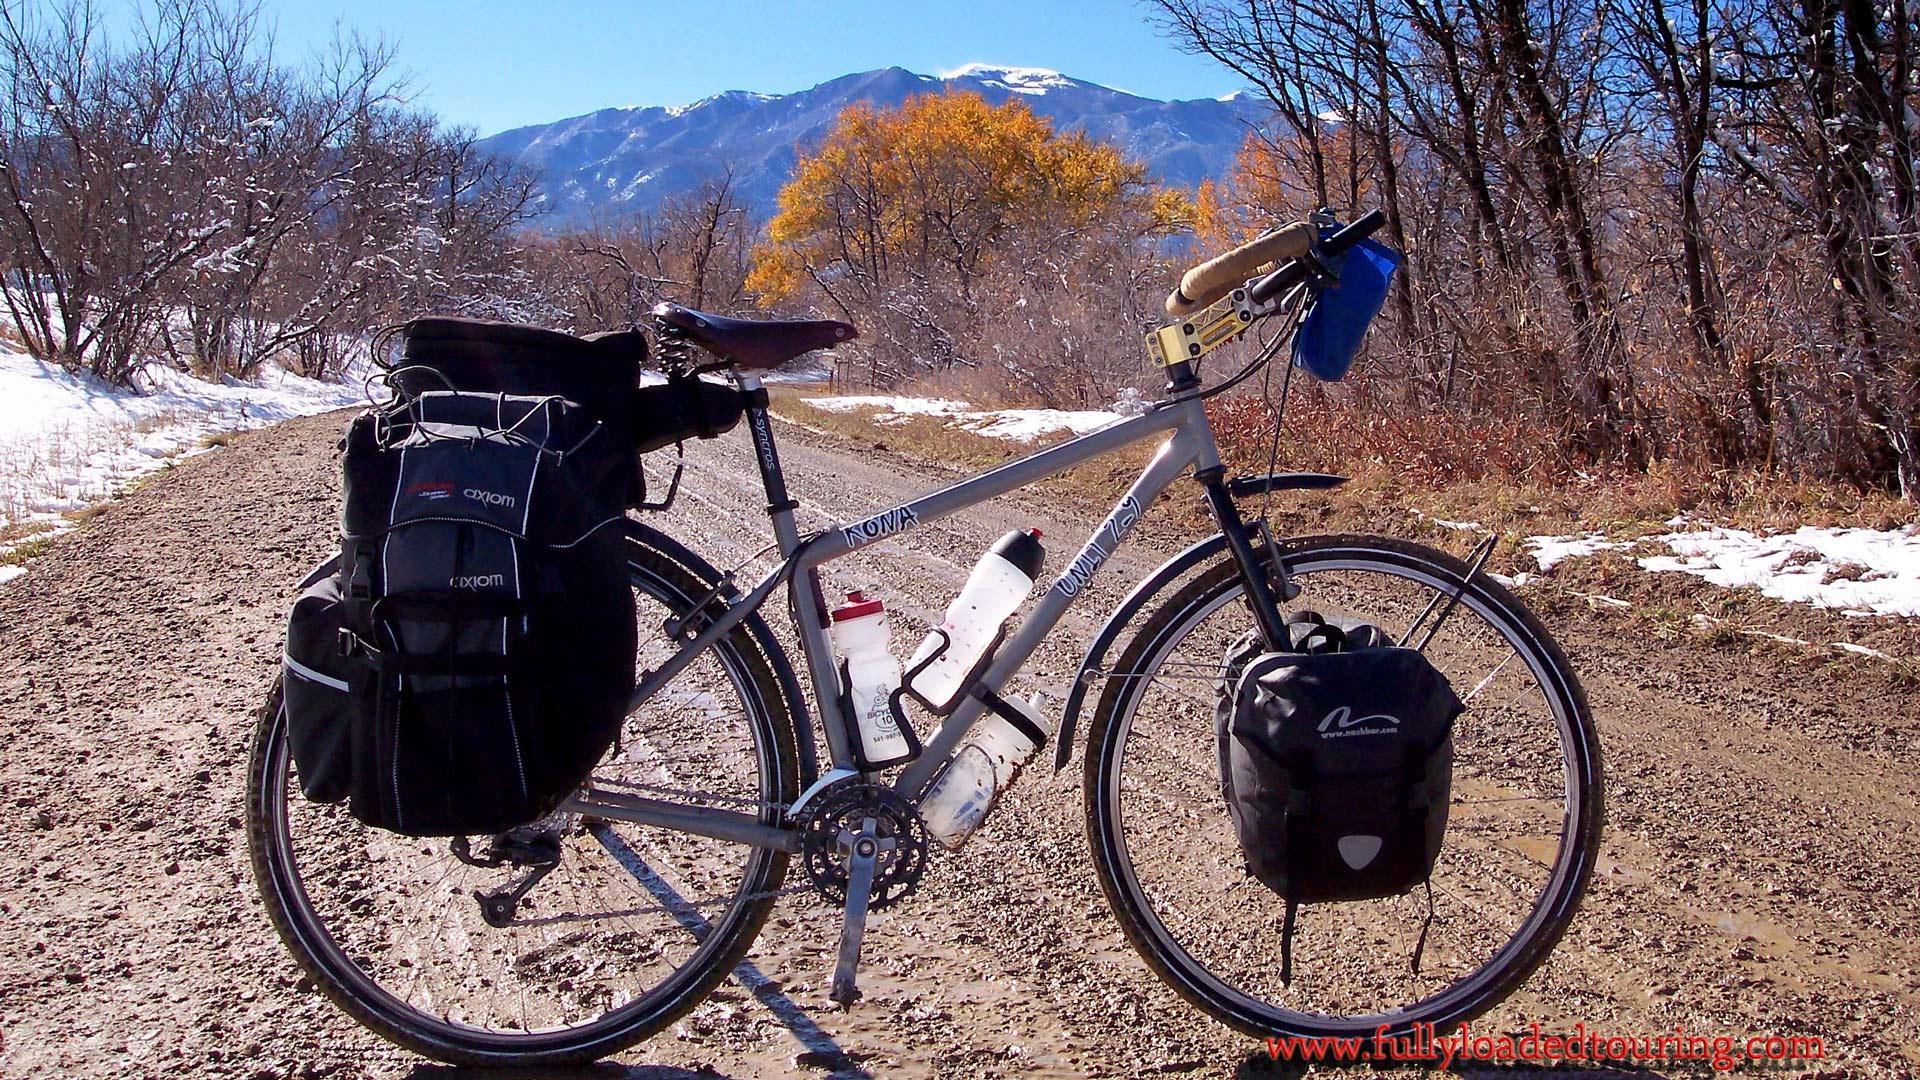 348    Ken - Touring Colorado - Kona Unit 2-9 touring bike